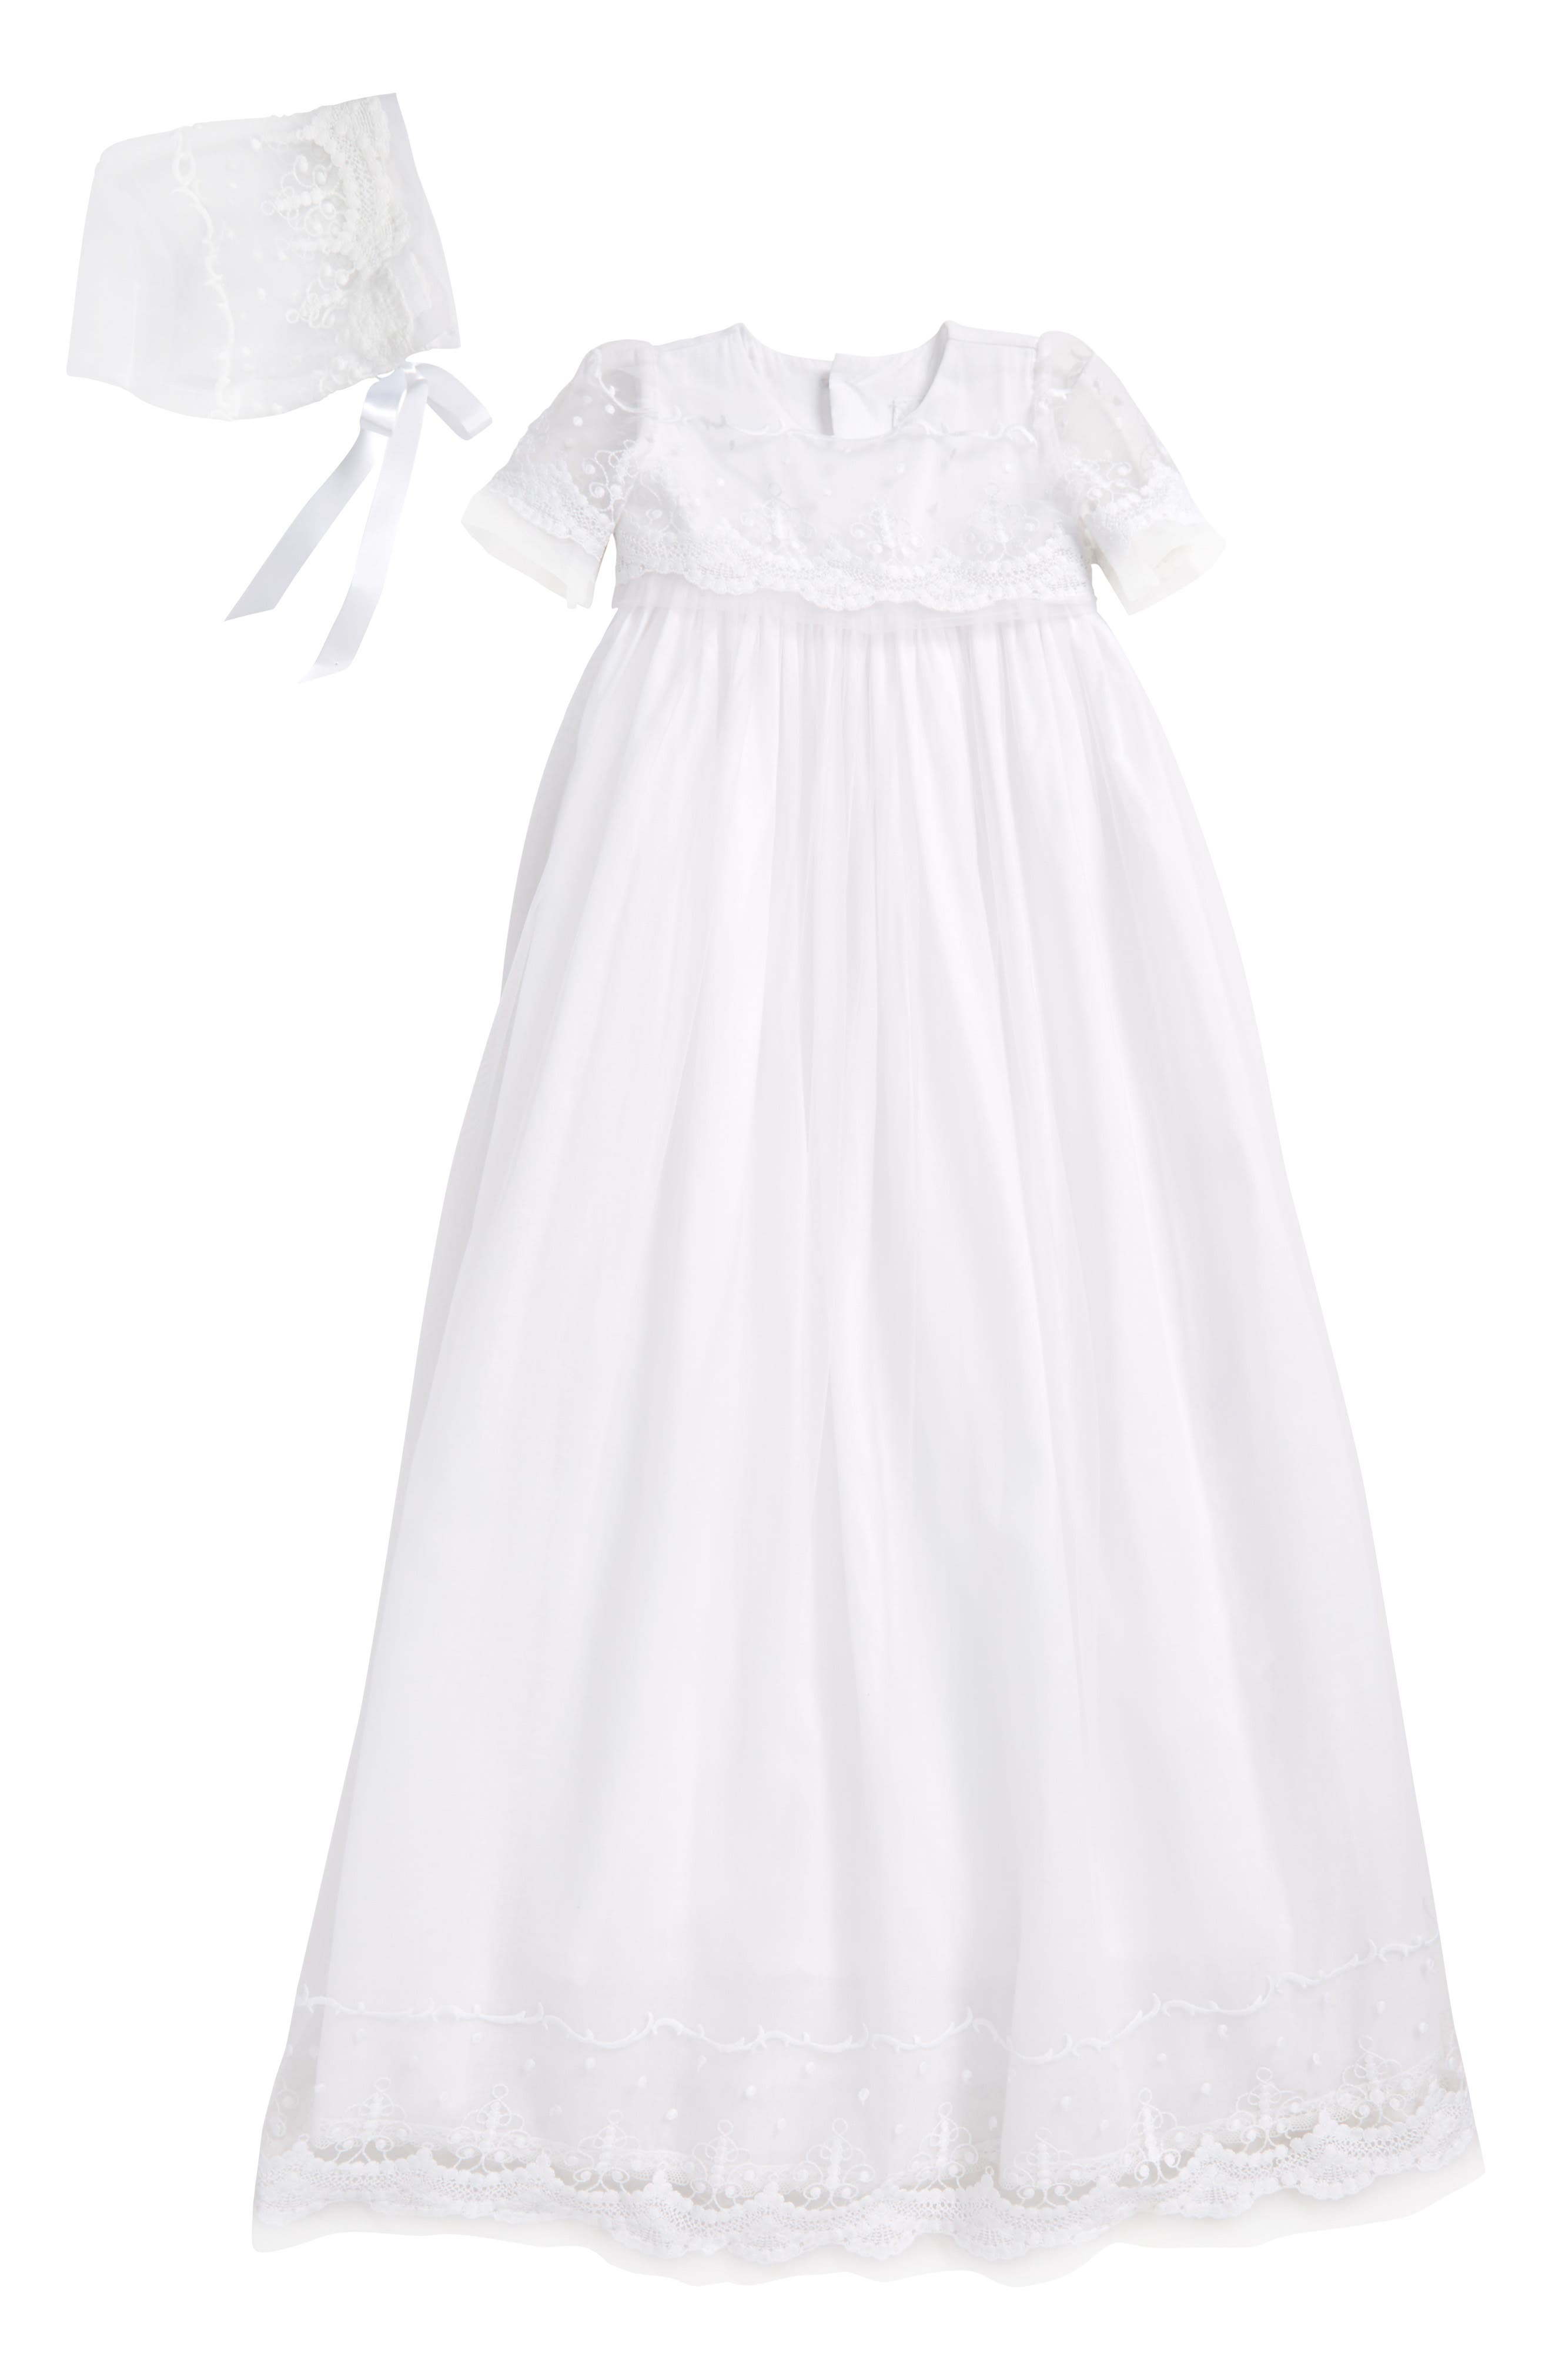 Blessing Christening Gown & Bonnet Set,                         Main,                         color, White